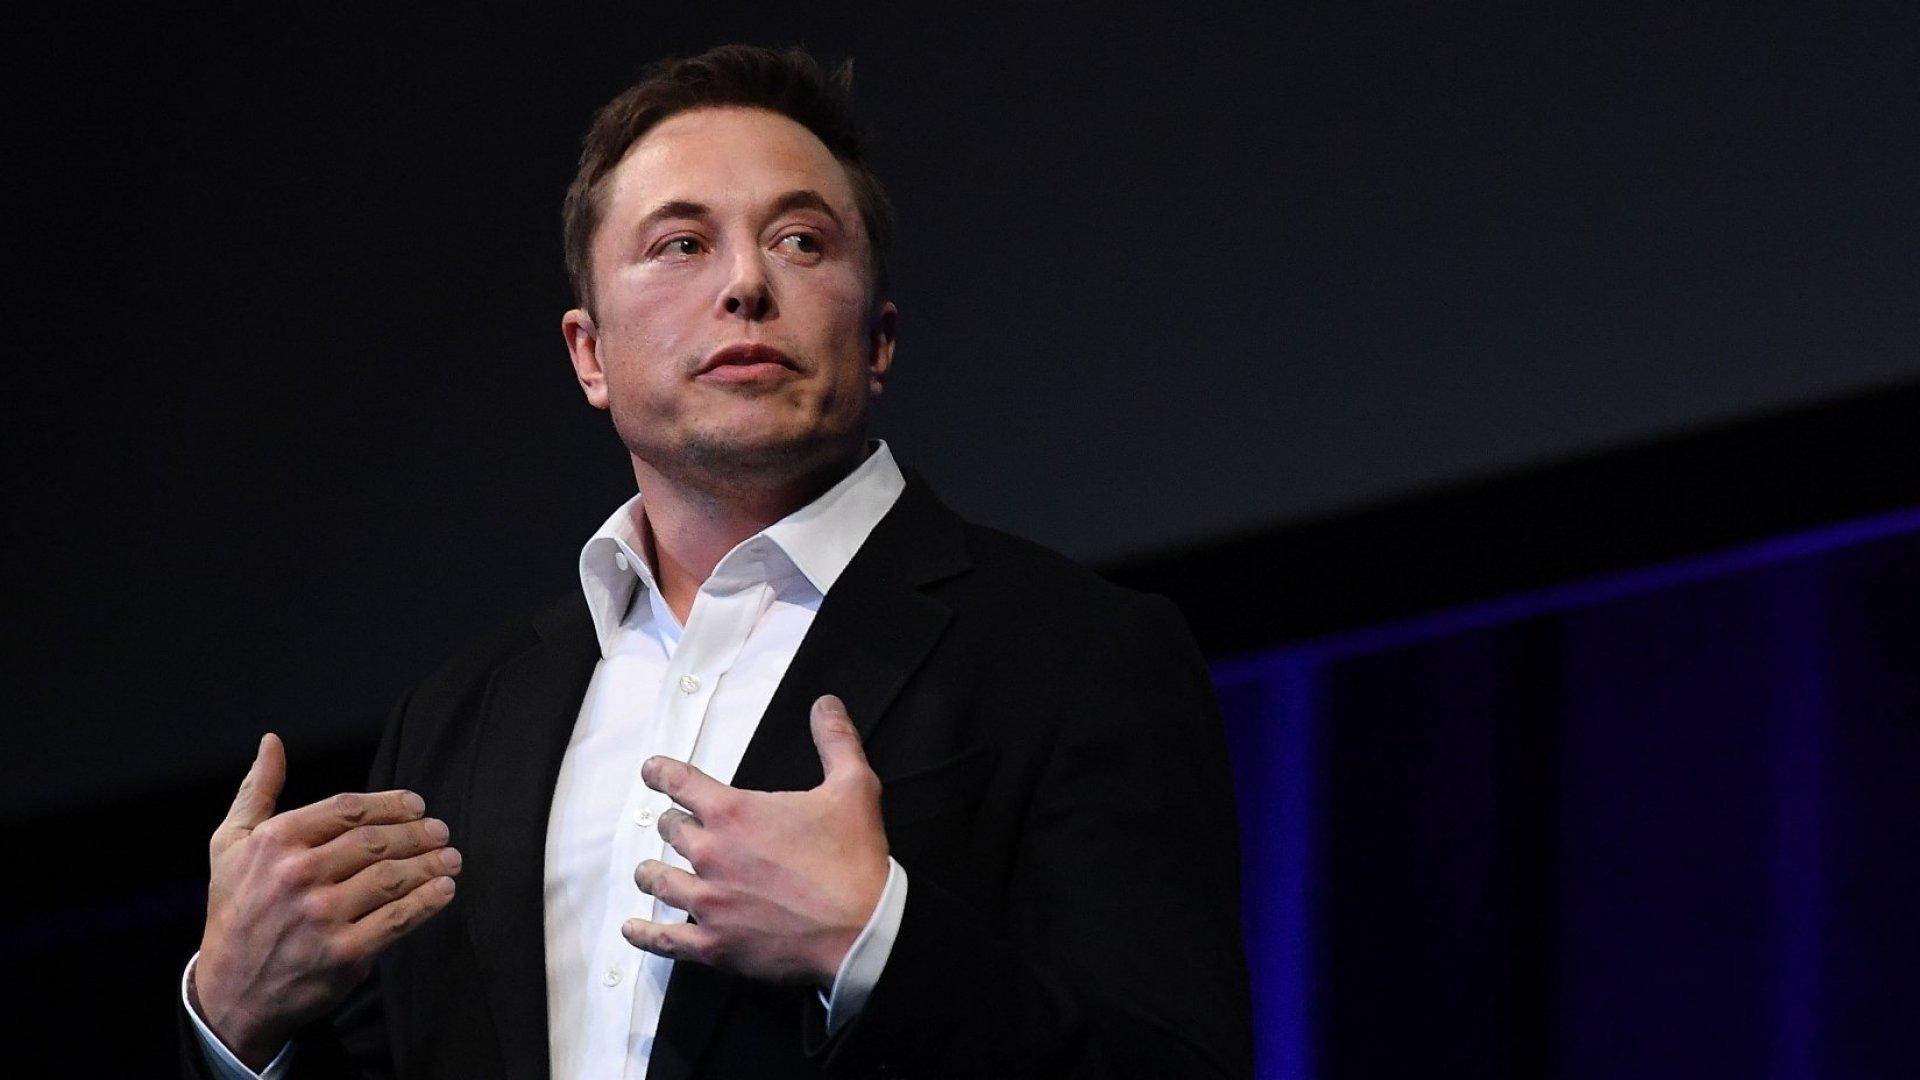 Tech entrepreneur Elon Musk